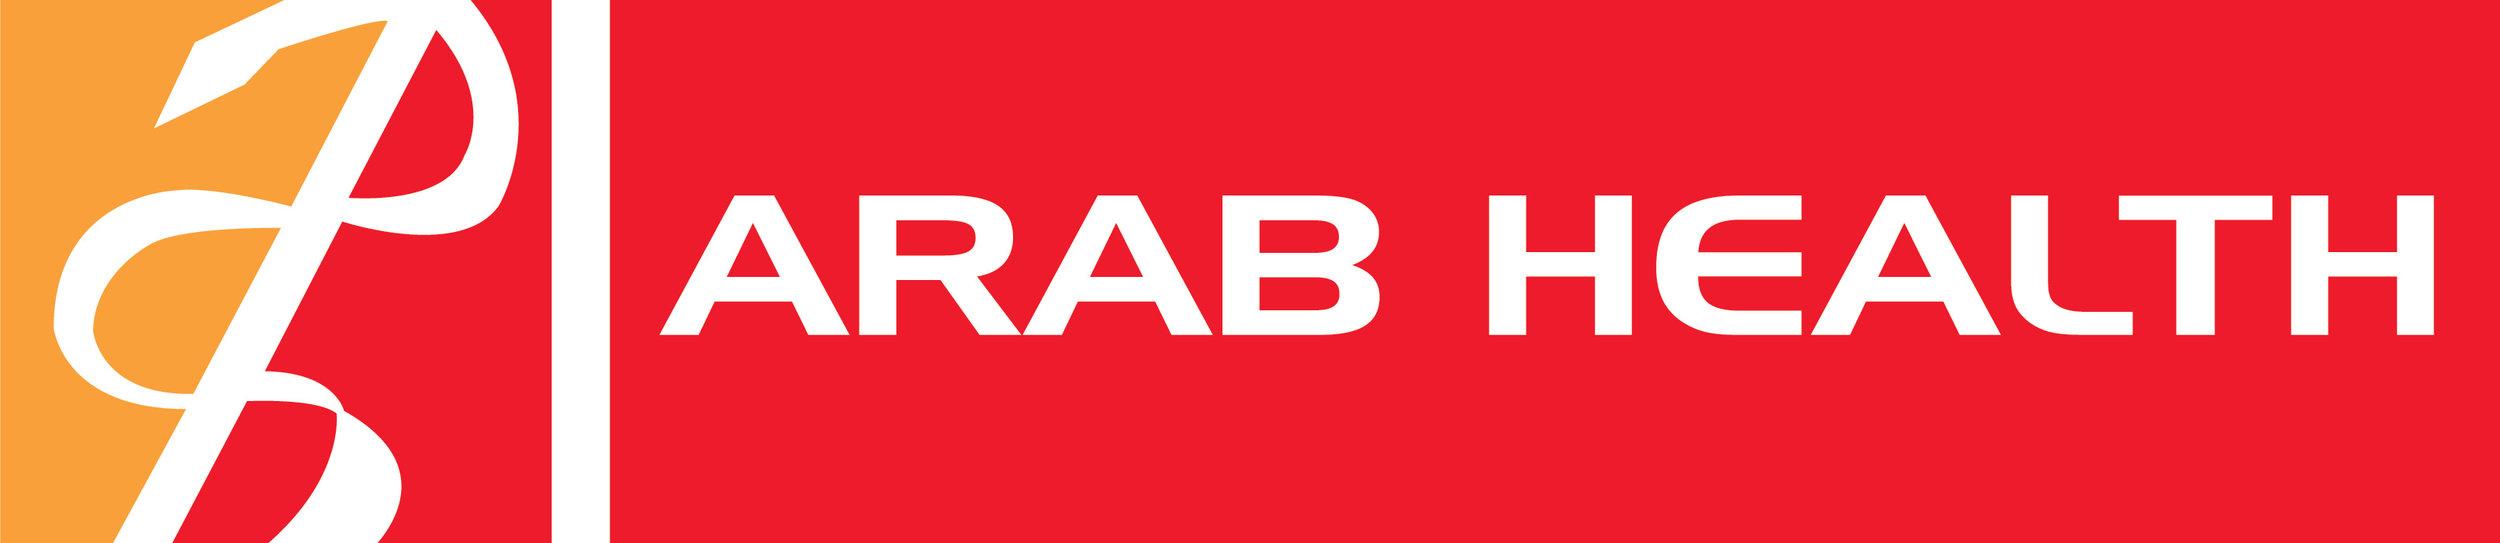 Arab-health.jpg